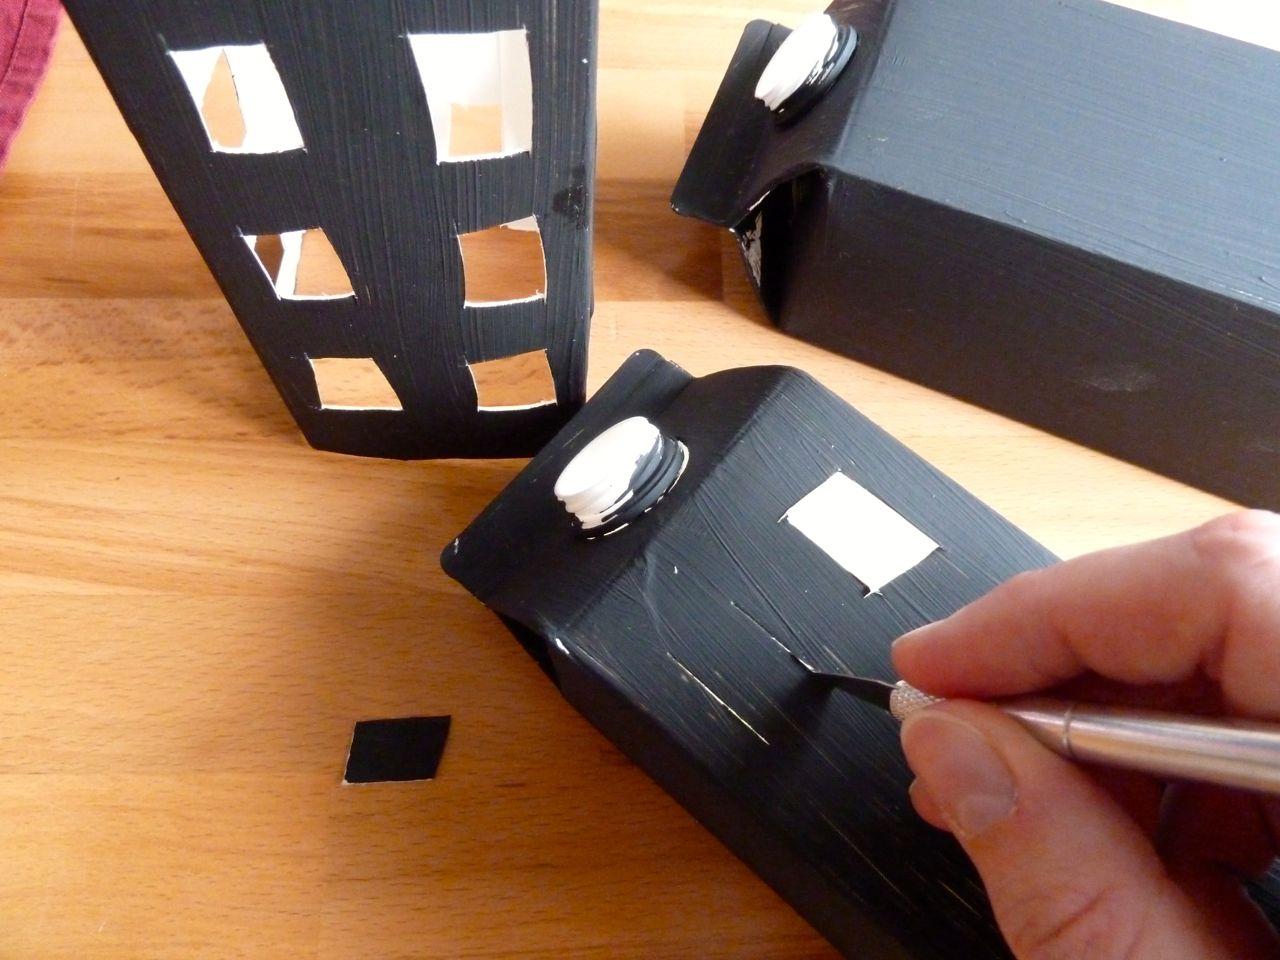 frische brise laternen aus tetrapaks. Black Bedroom Furniture Sets. Home Design Ideas